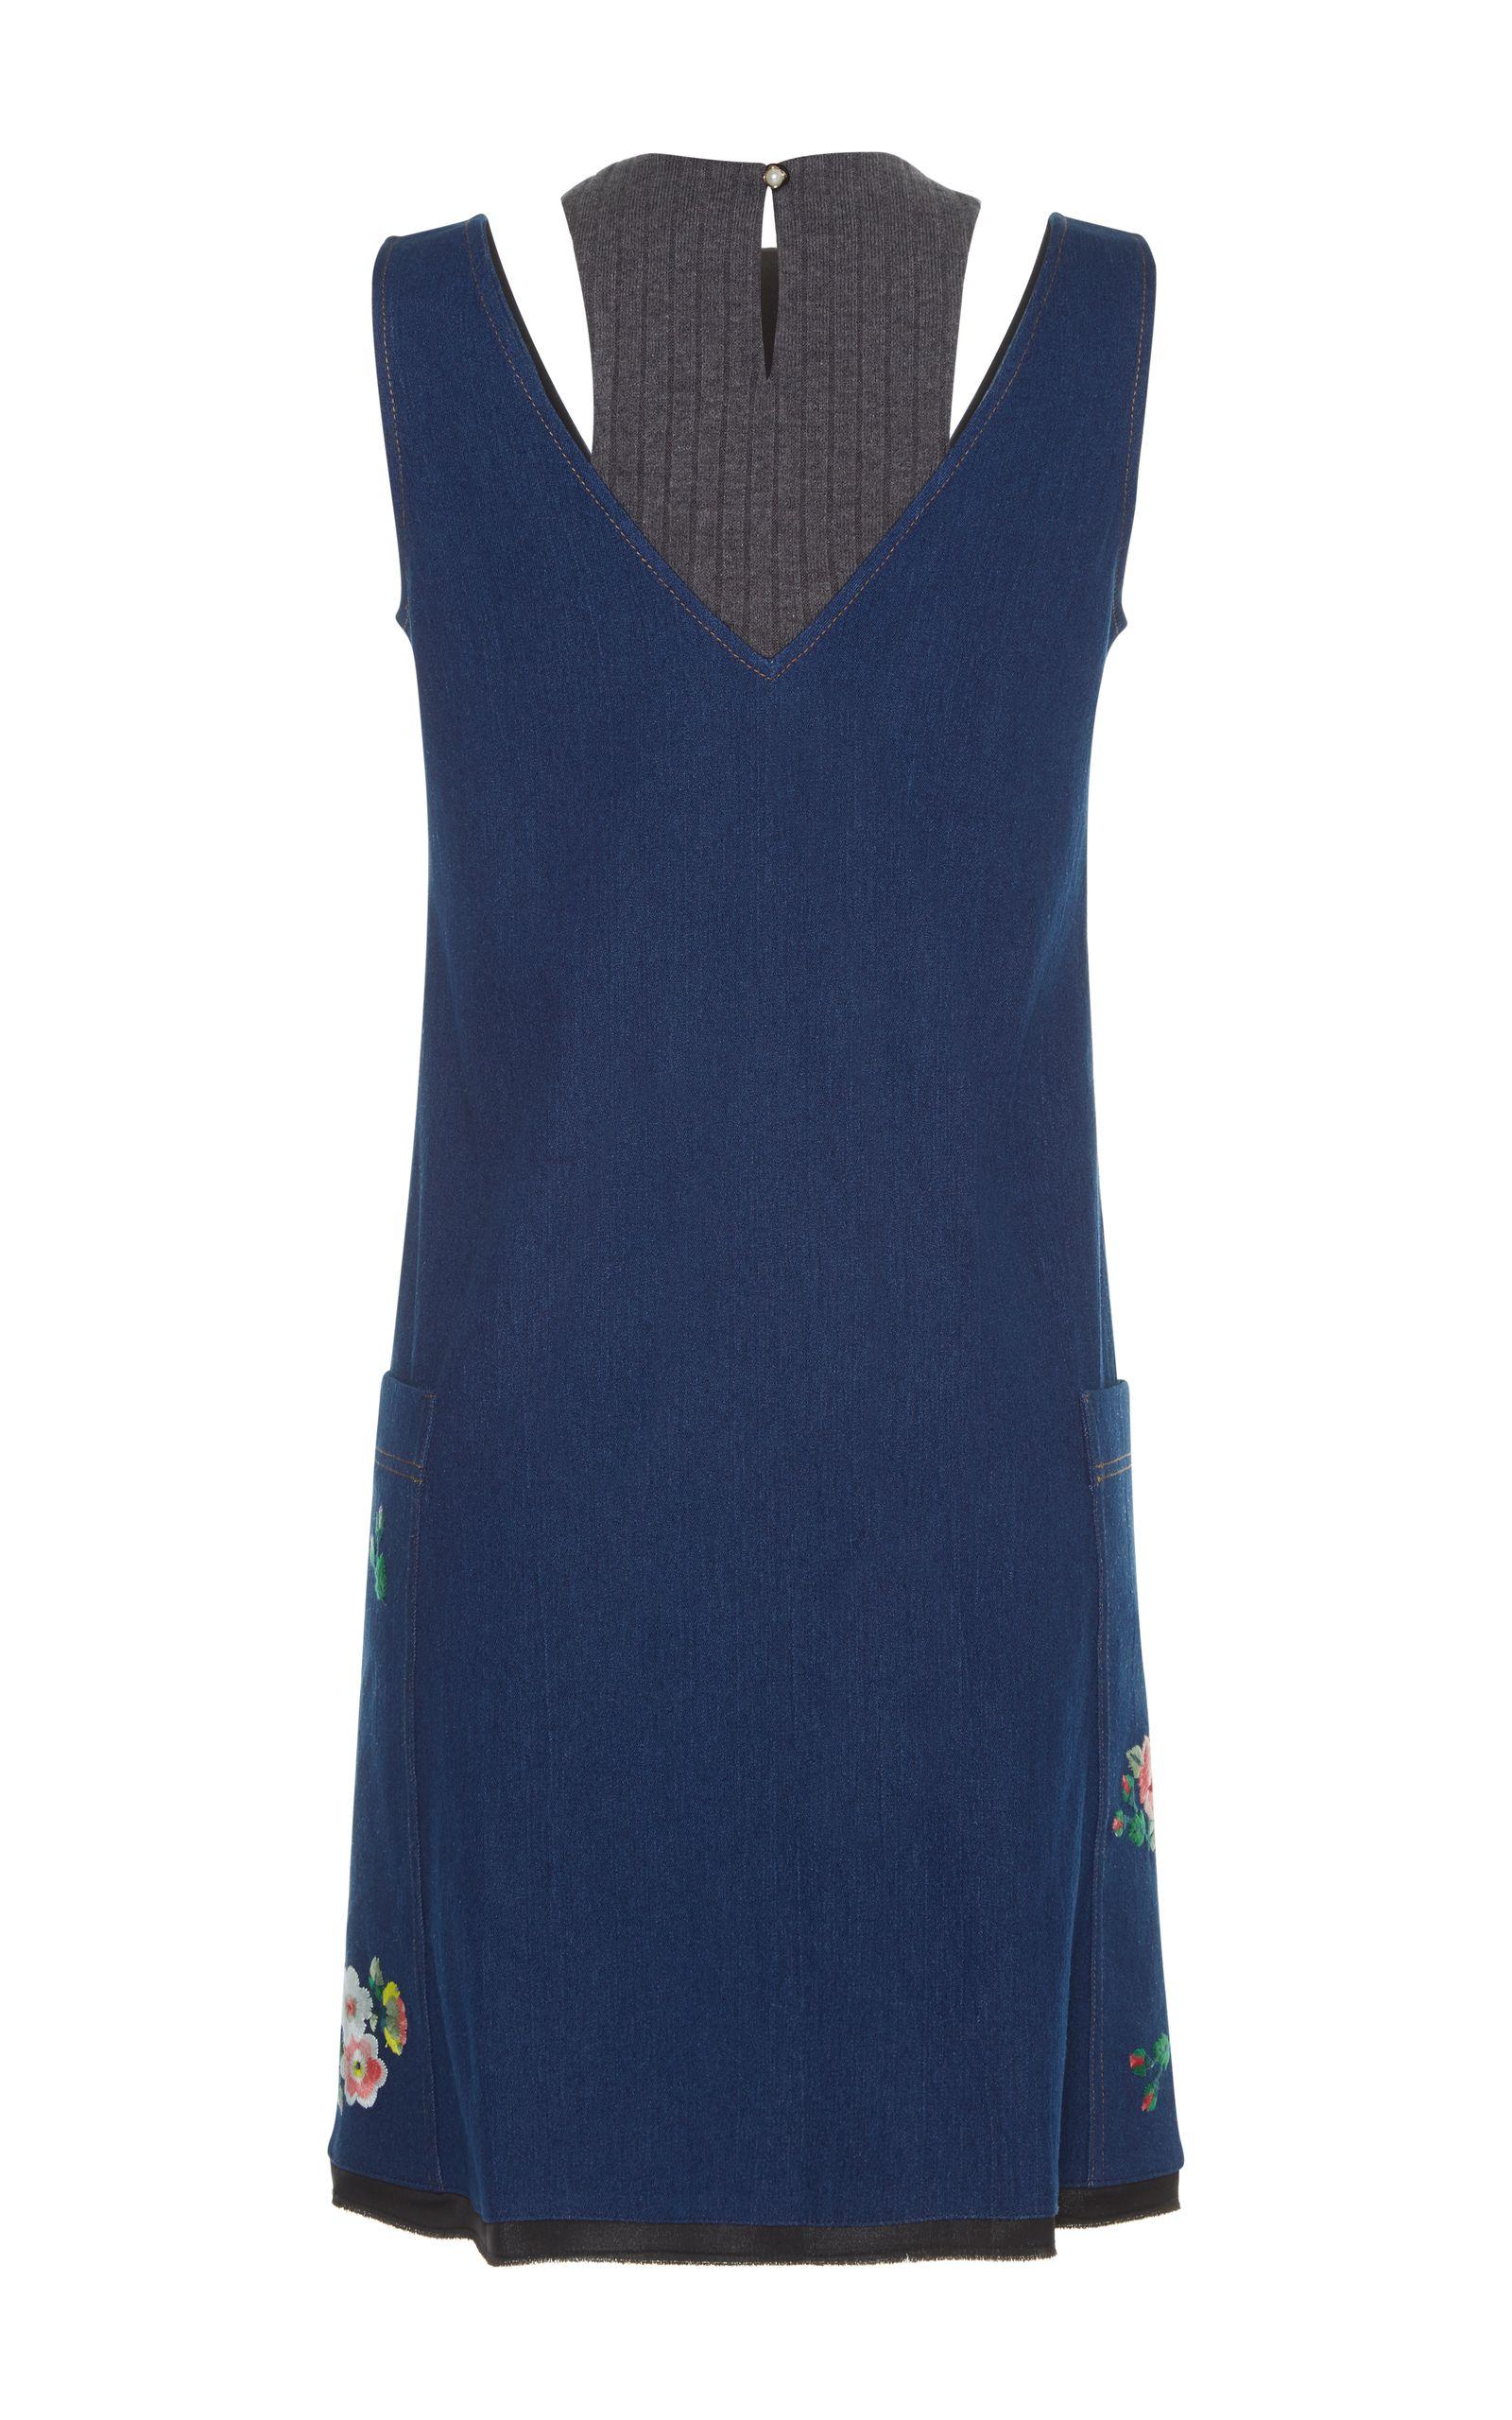 Adona Racerneck Combo Dress by ZAYAN THE LABEL for Preorder on Moda Operandi